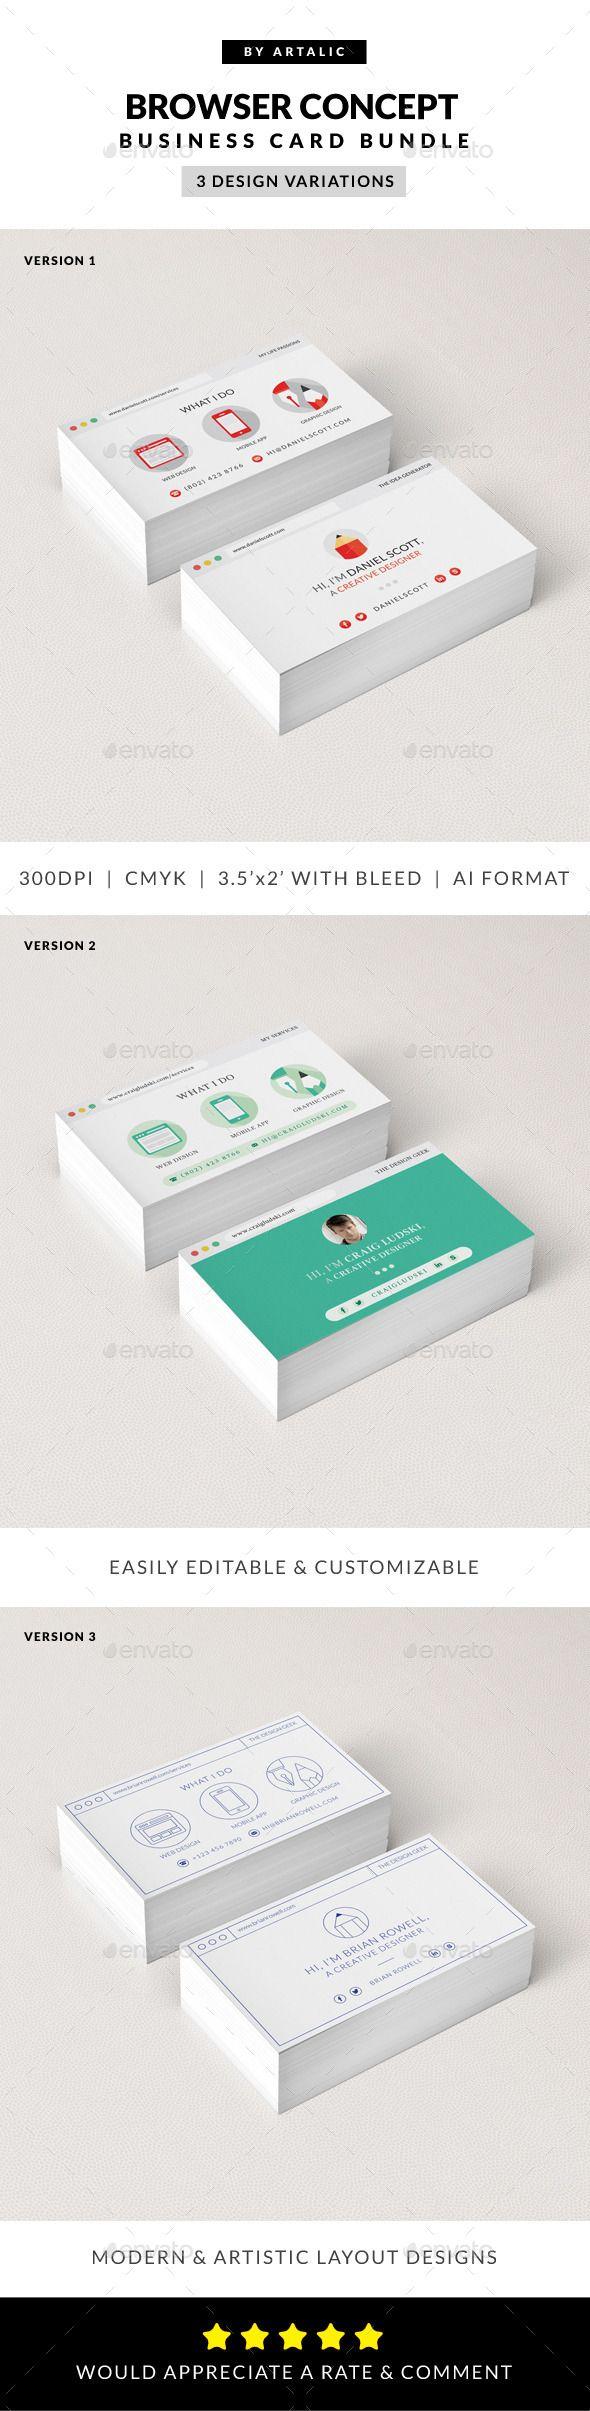 41 Best Business Card Inspiration Images On Pinterest Visit Cards